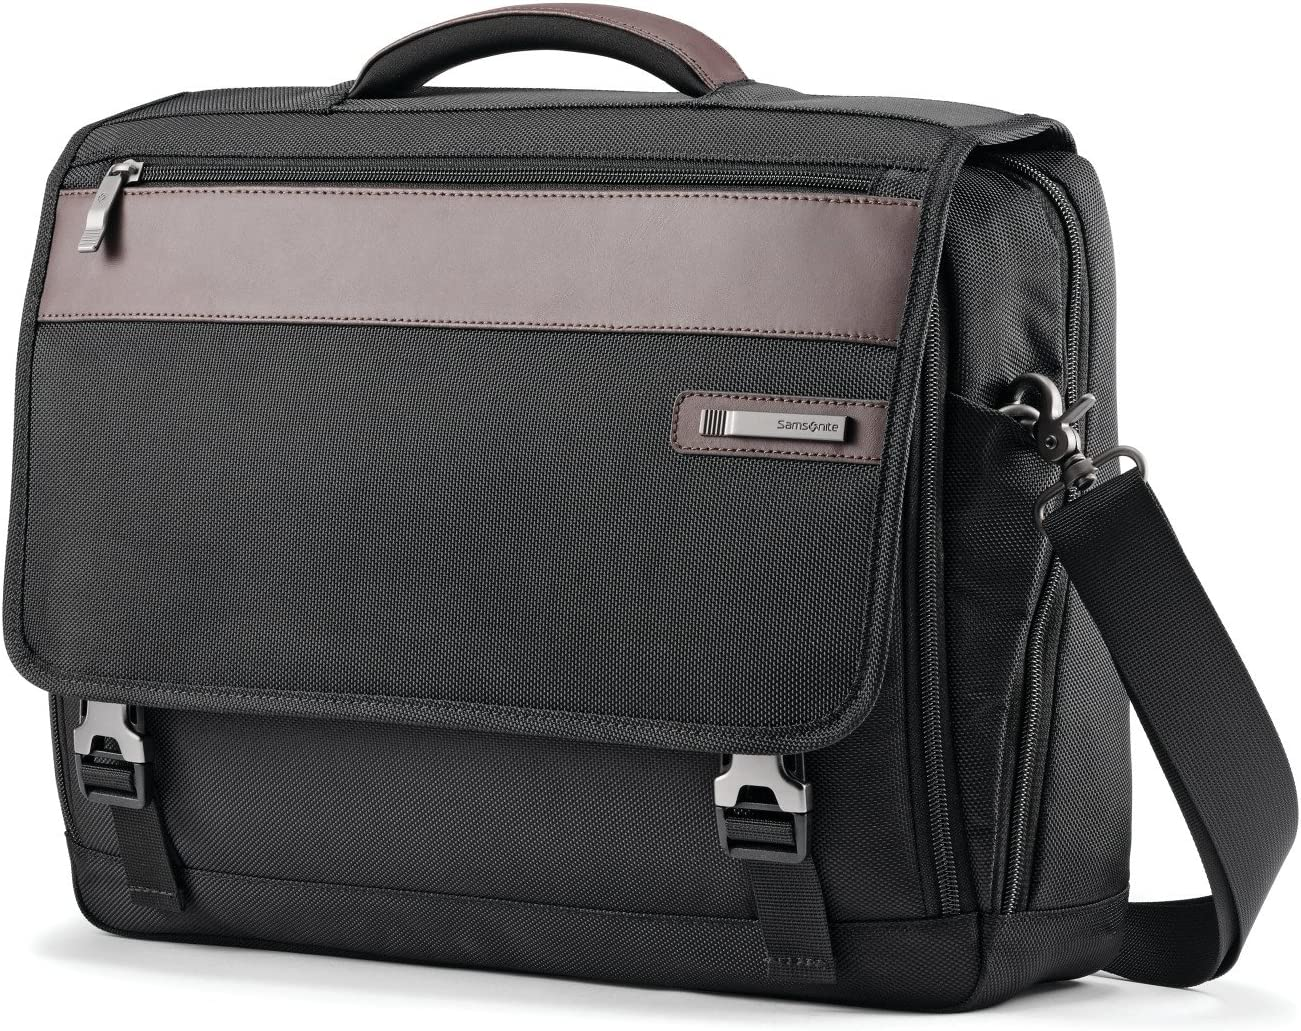 Samsonite Kombi Flapover Briefcase, Black/Brown, One Size